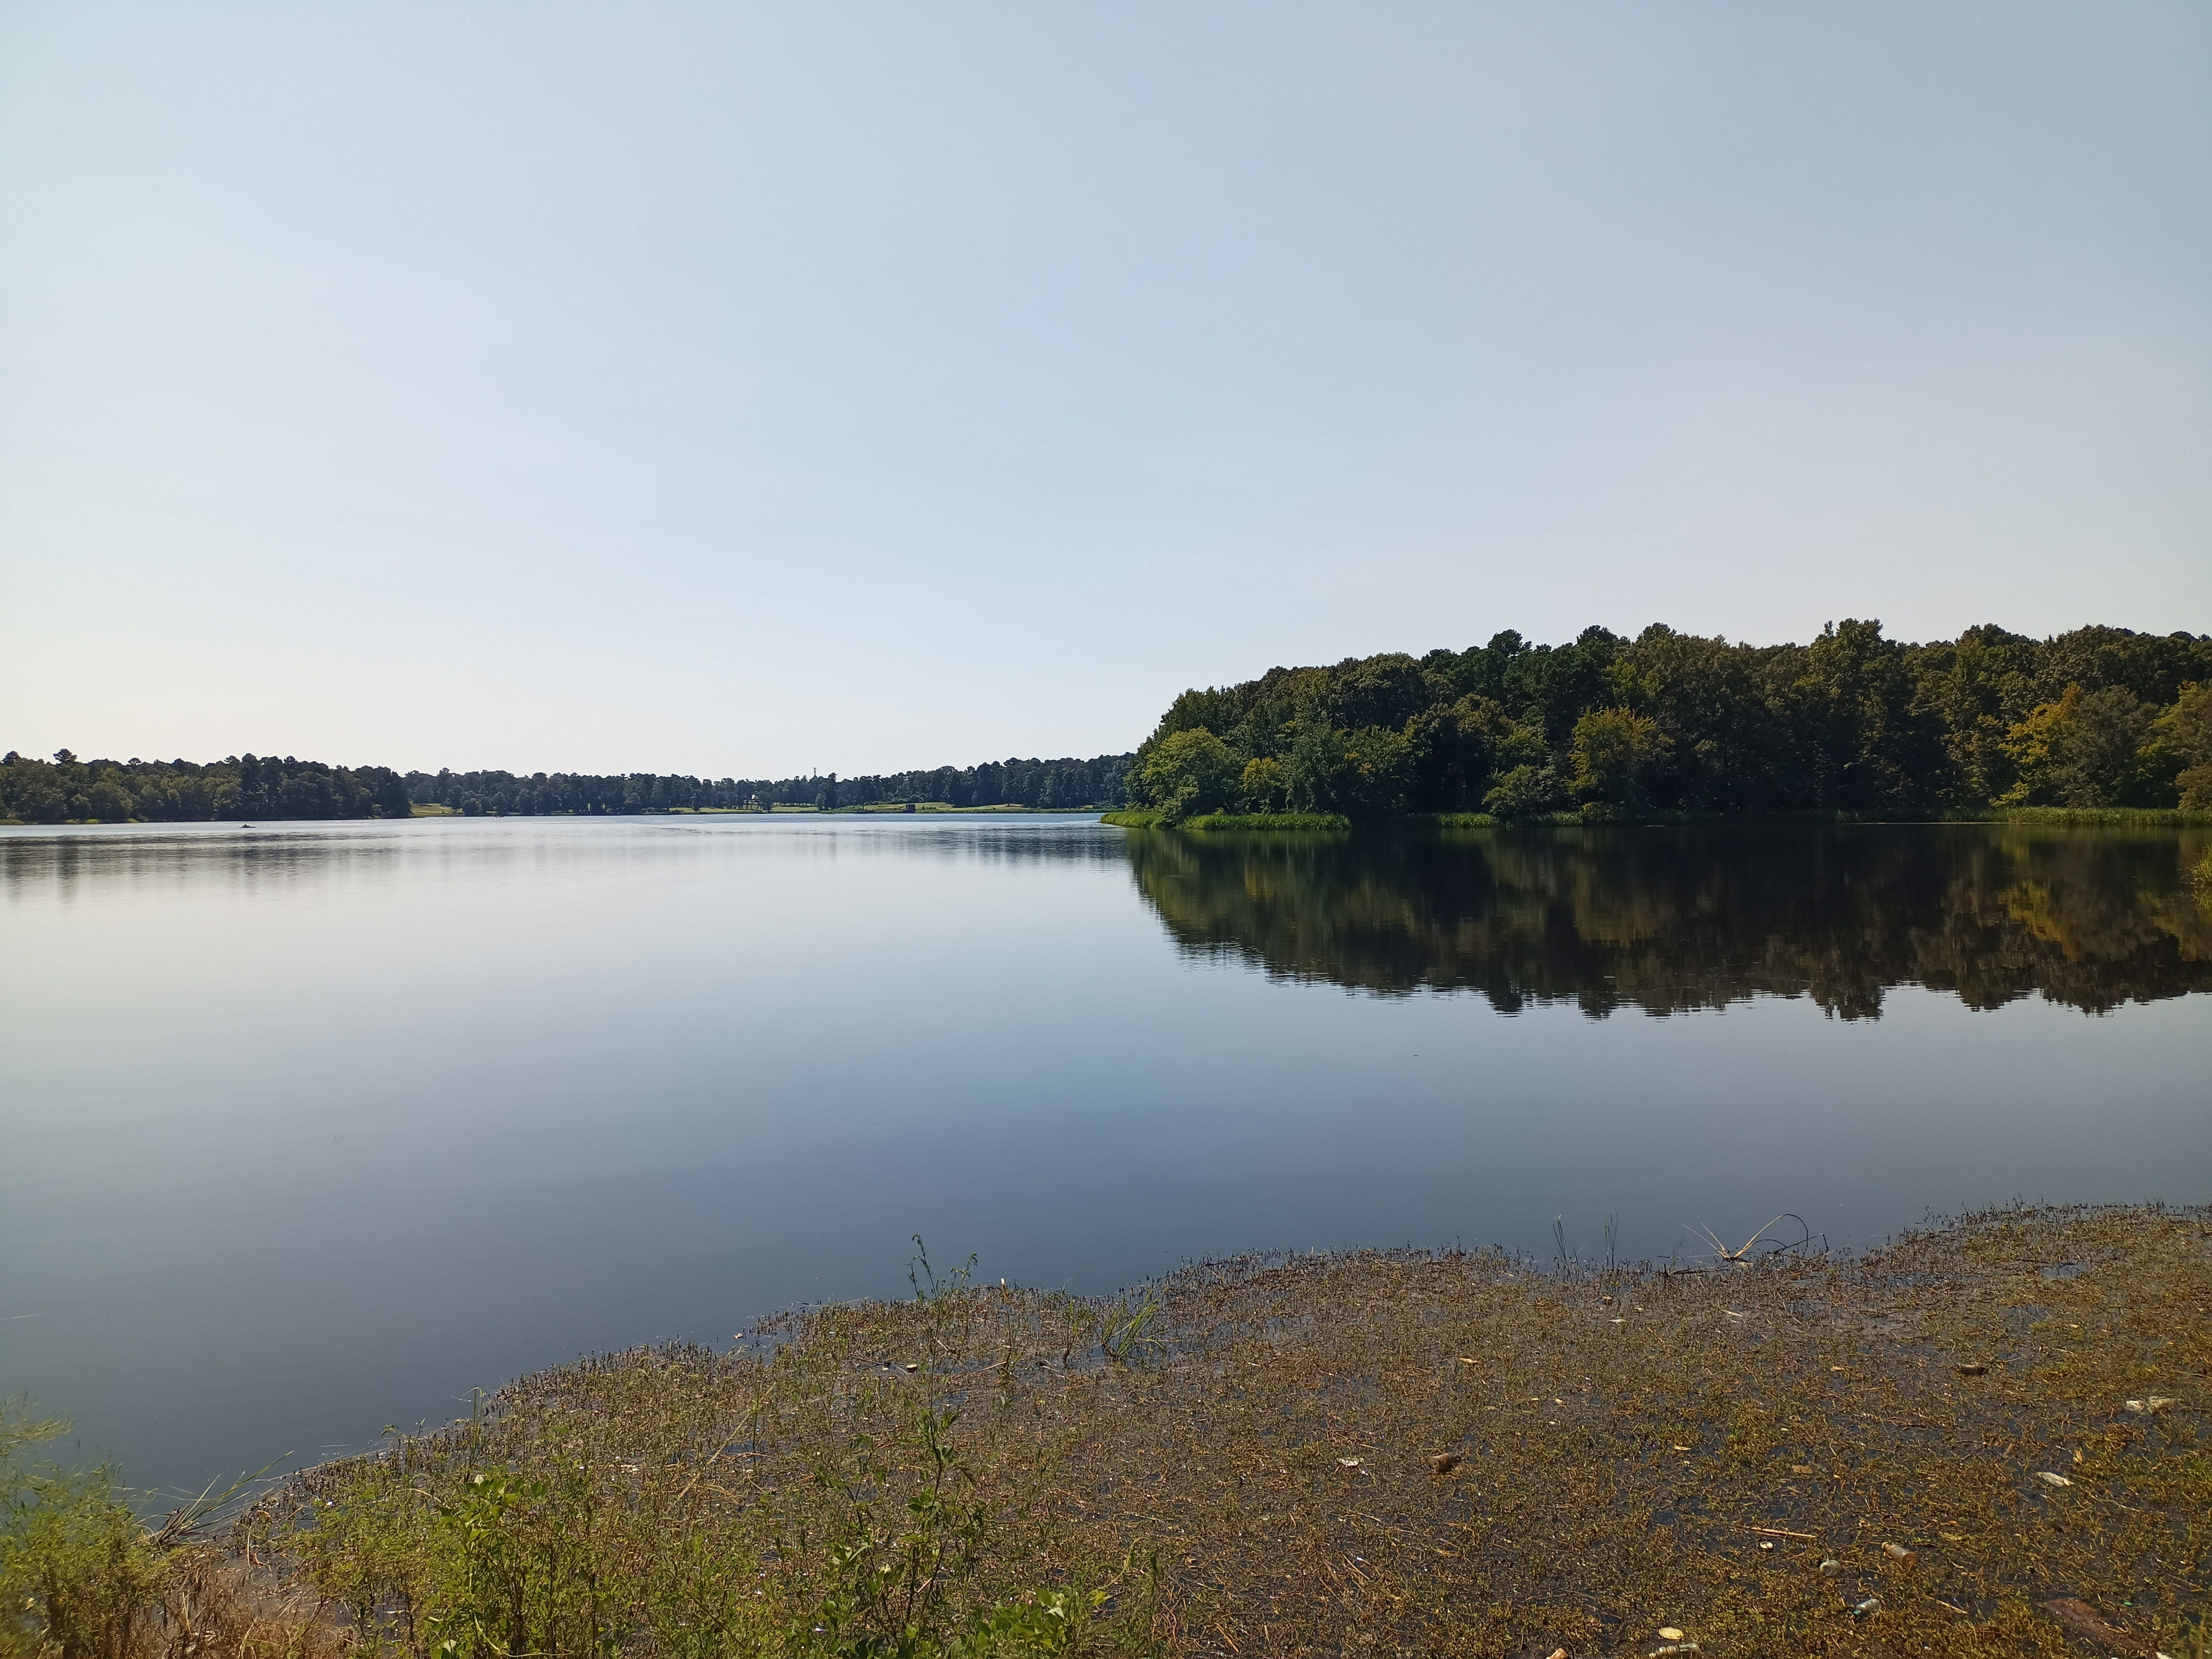 BLU g91 Pro photo sample: a landscape with a lake, regular crop